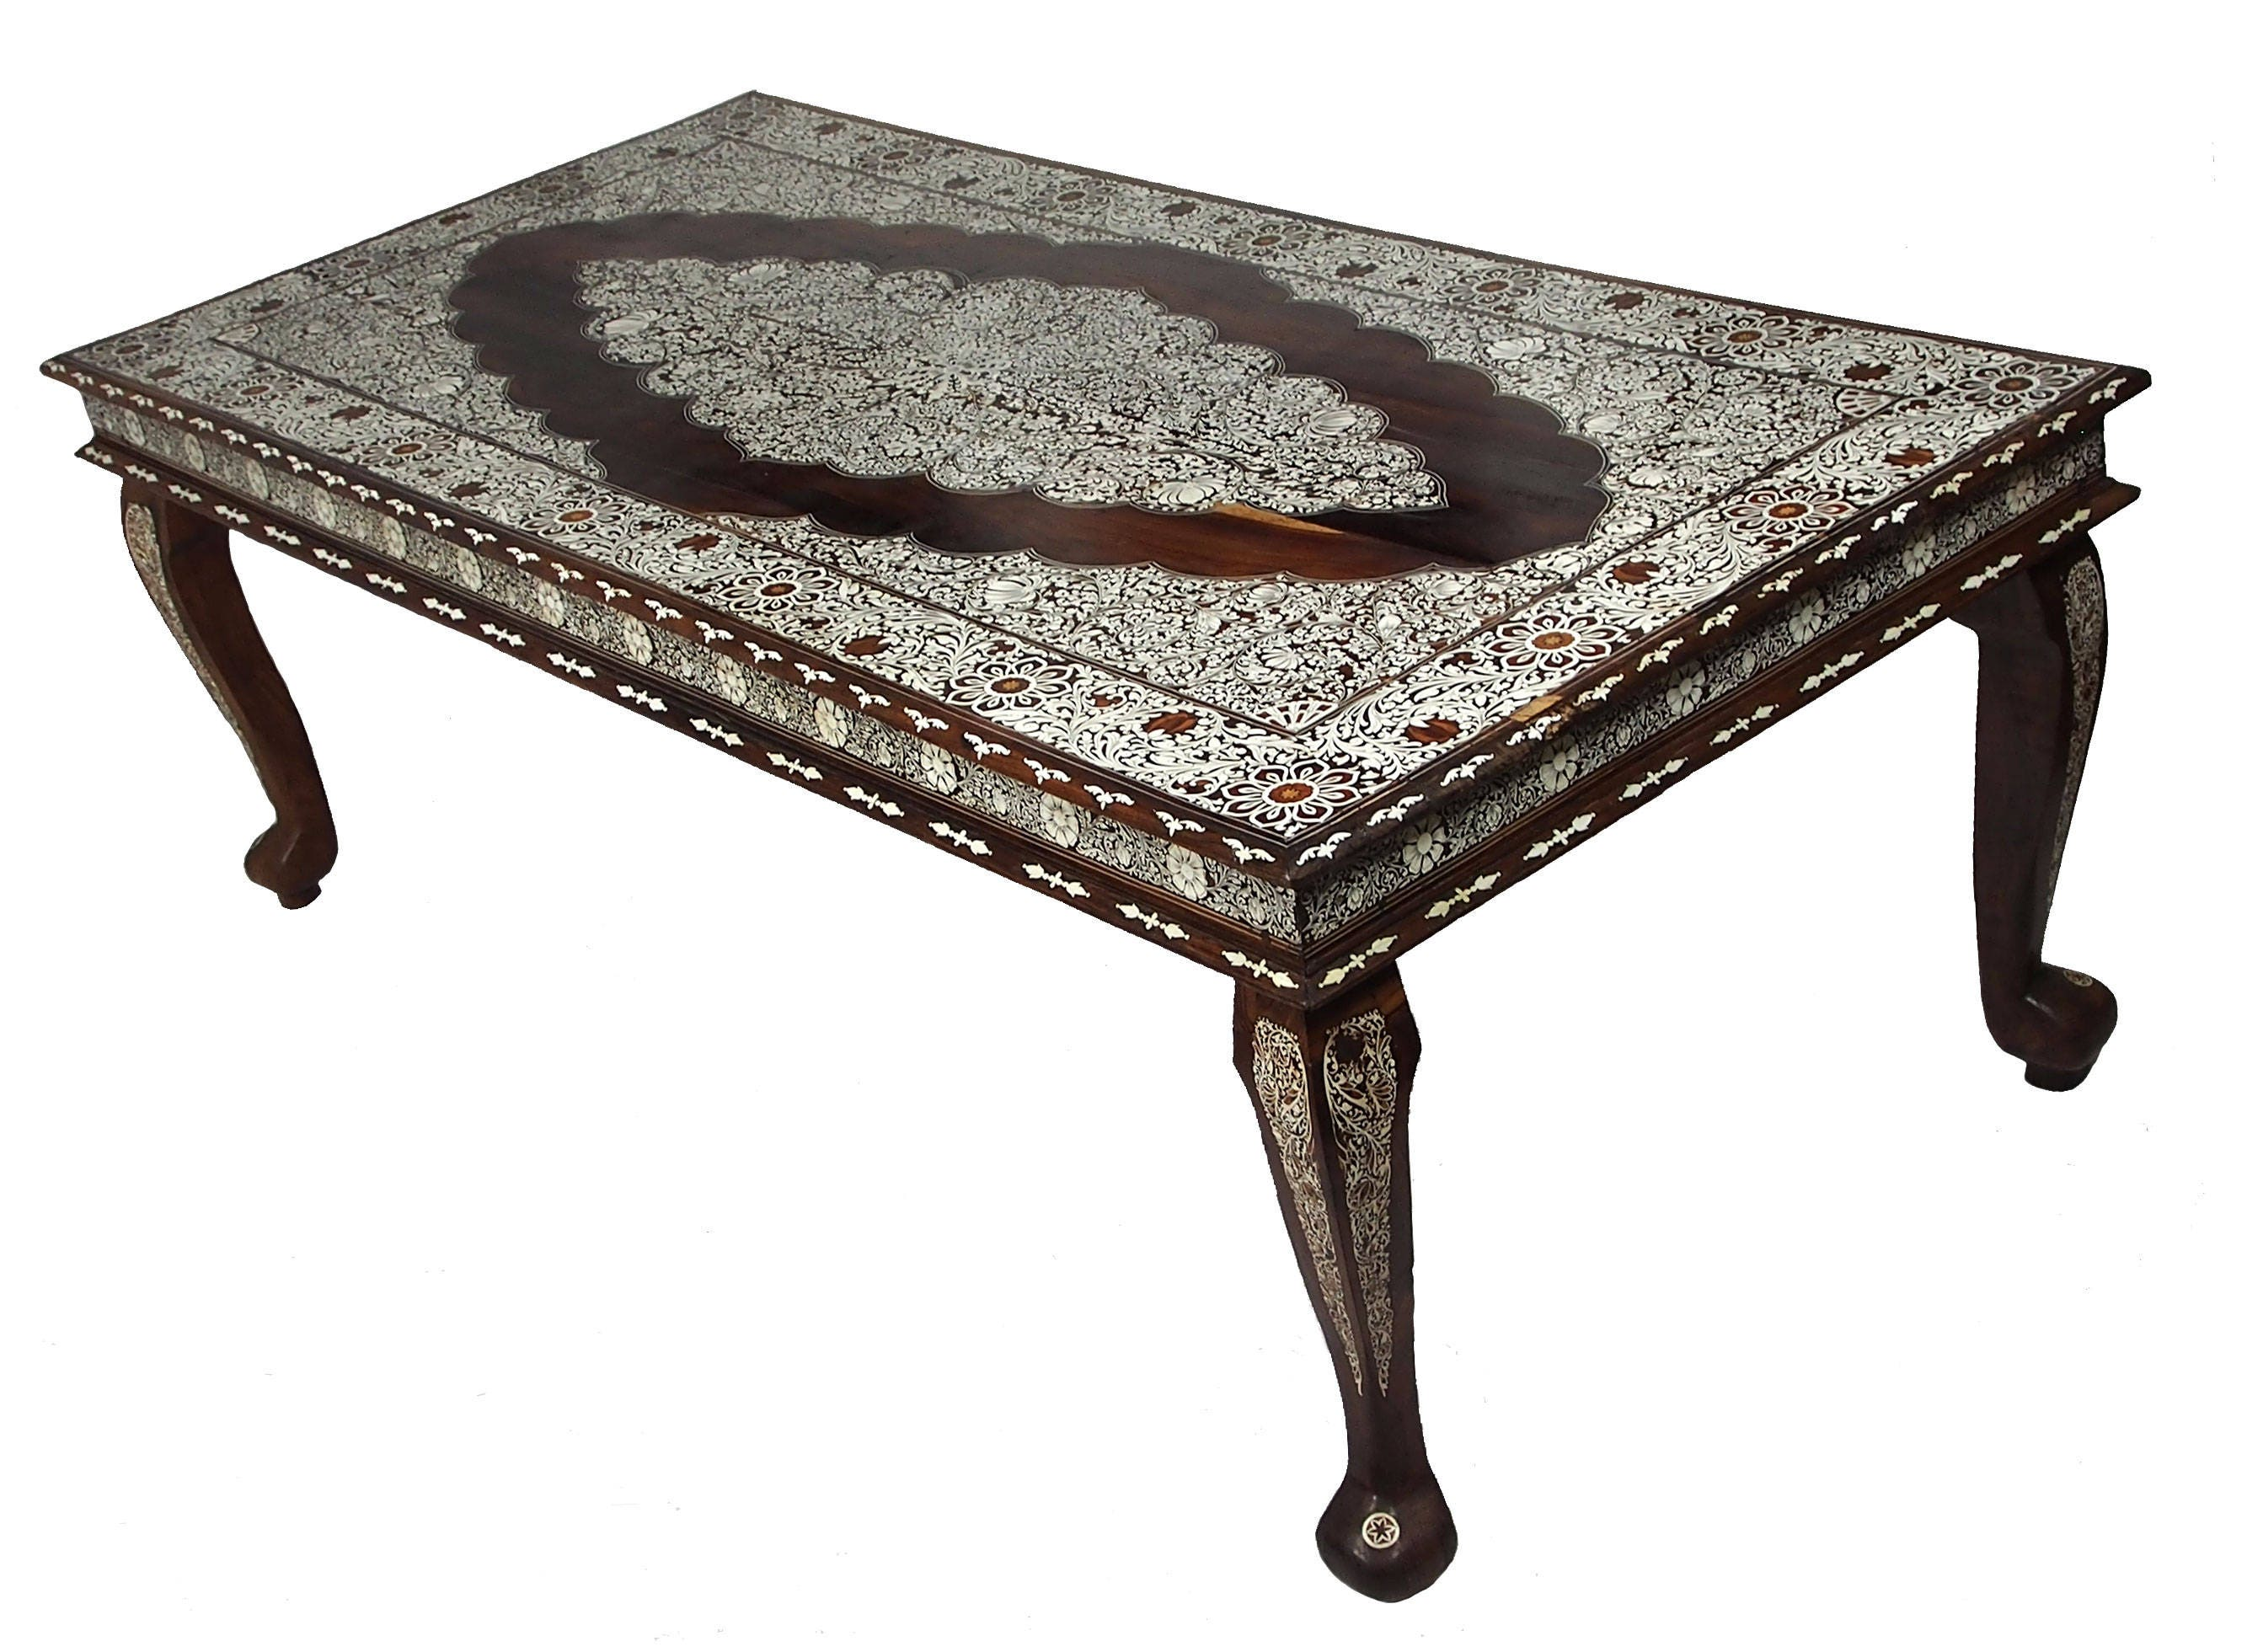 240x120 cm antik orient kolonial Massiv holz handgeschnitzte   Etsy